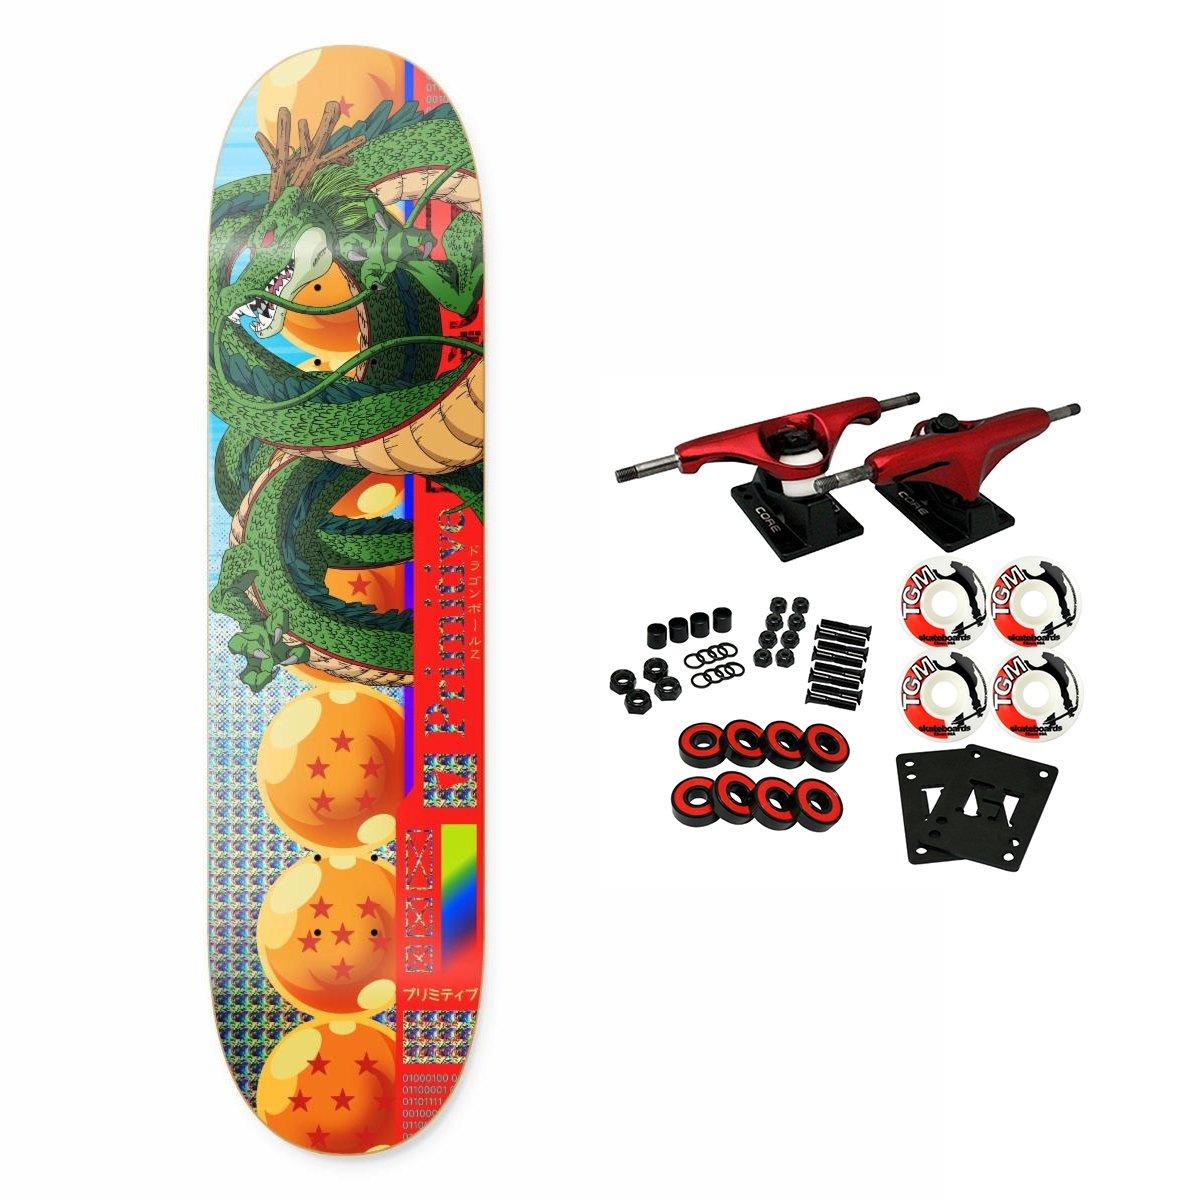 Primitive Dragon Ball Z Shenron Cell Skateboard Complete 7.8'' by Primitive (Image #1)